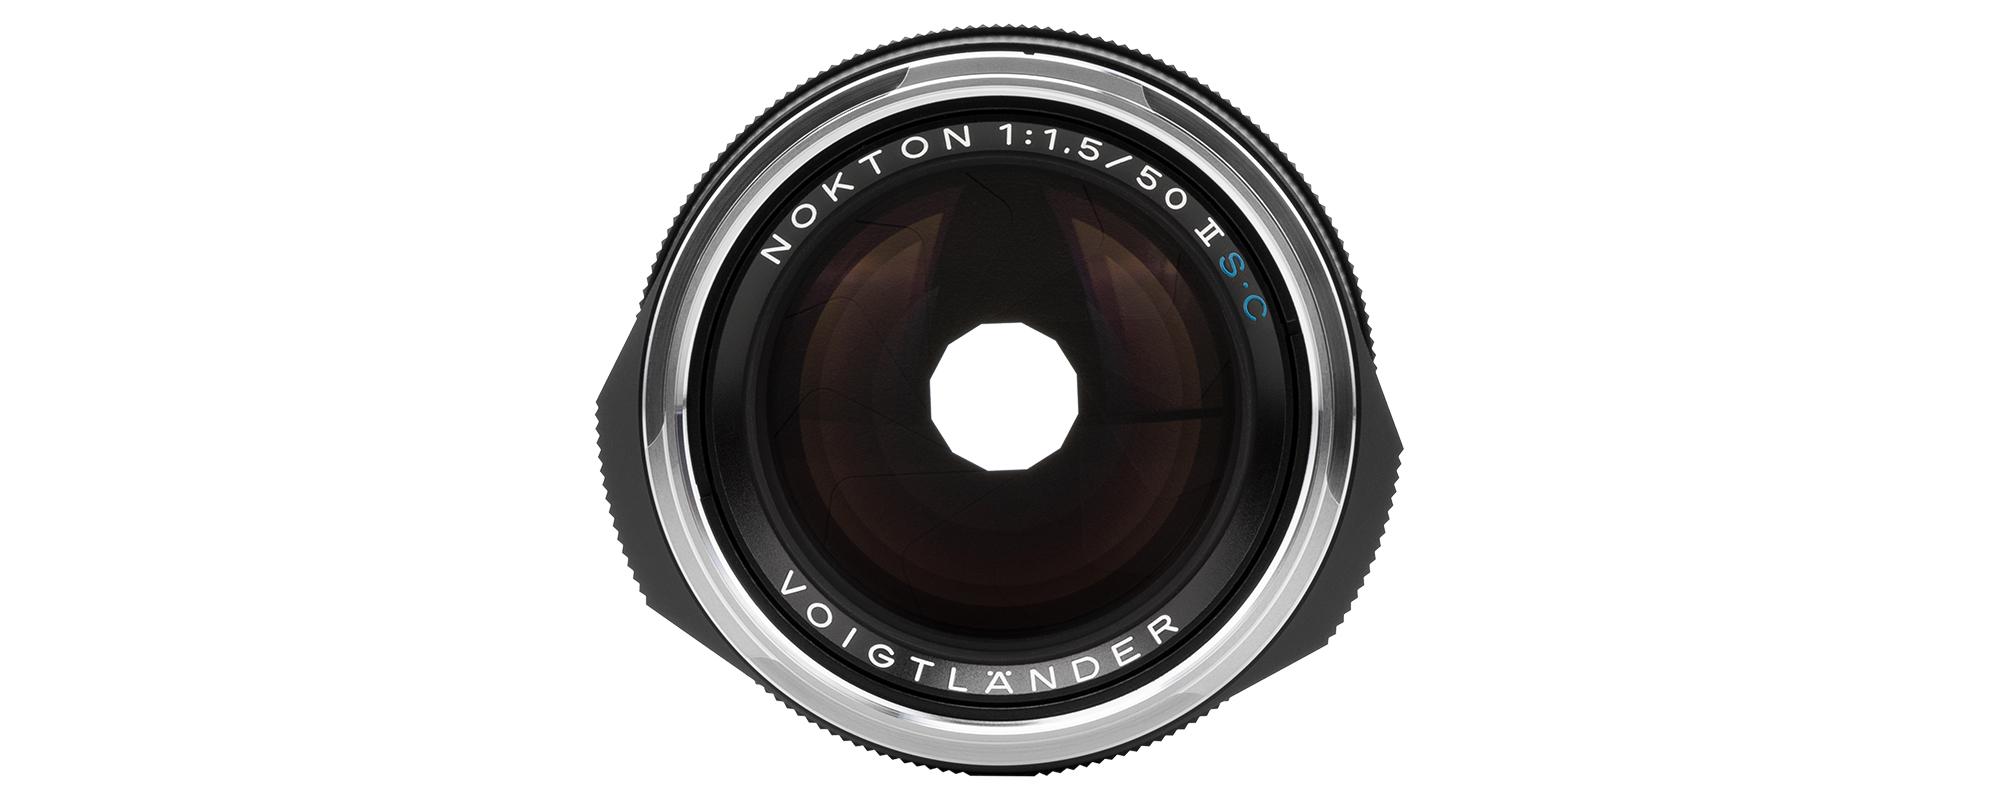 Obiektyw Voigtlander Nokton II 50 mm f/1,5 do Leica M - SC, czarny